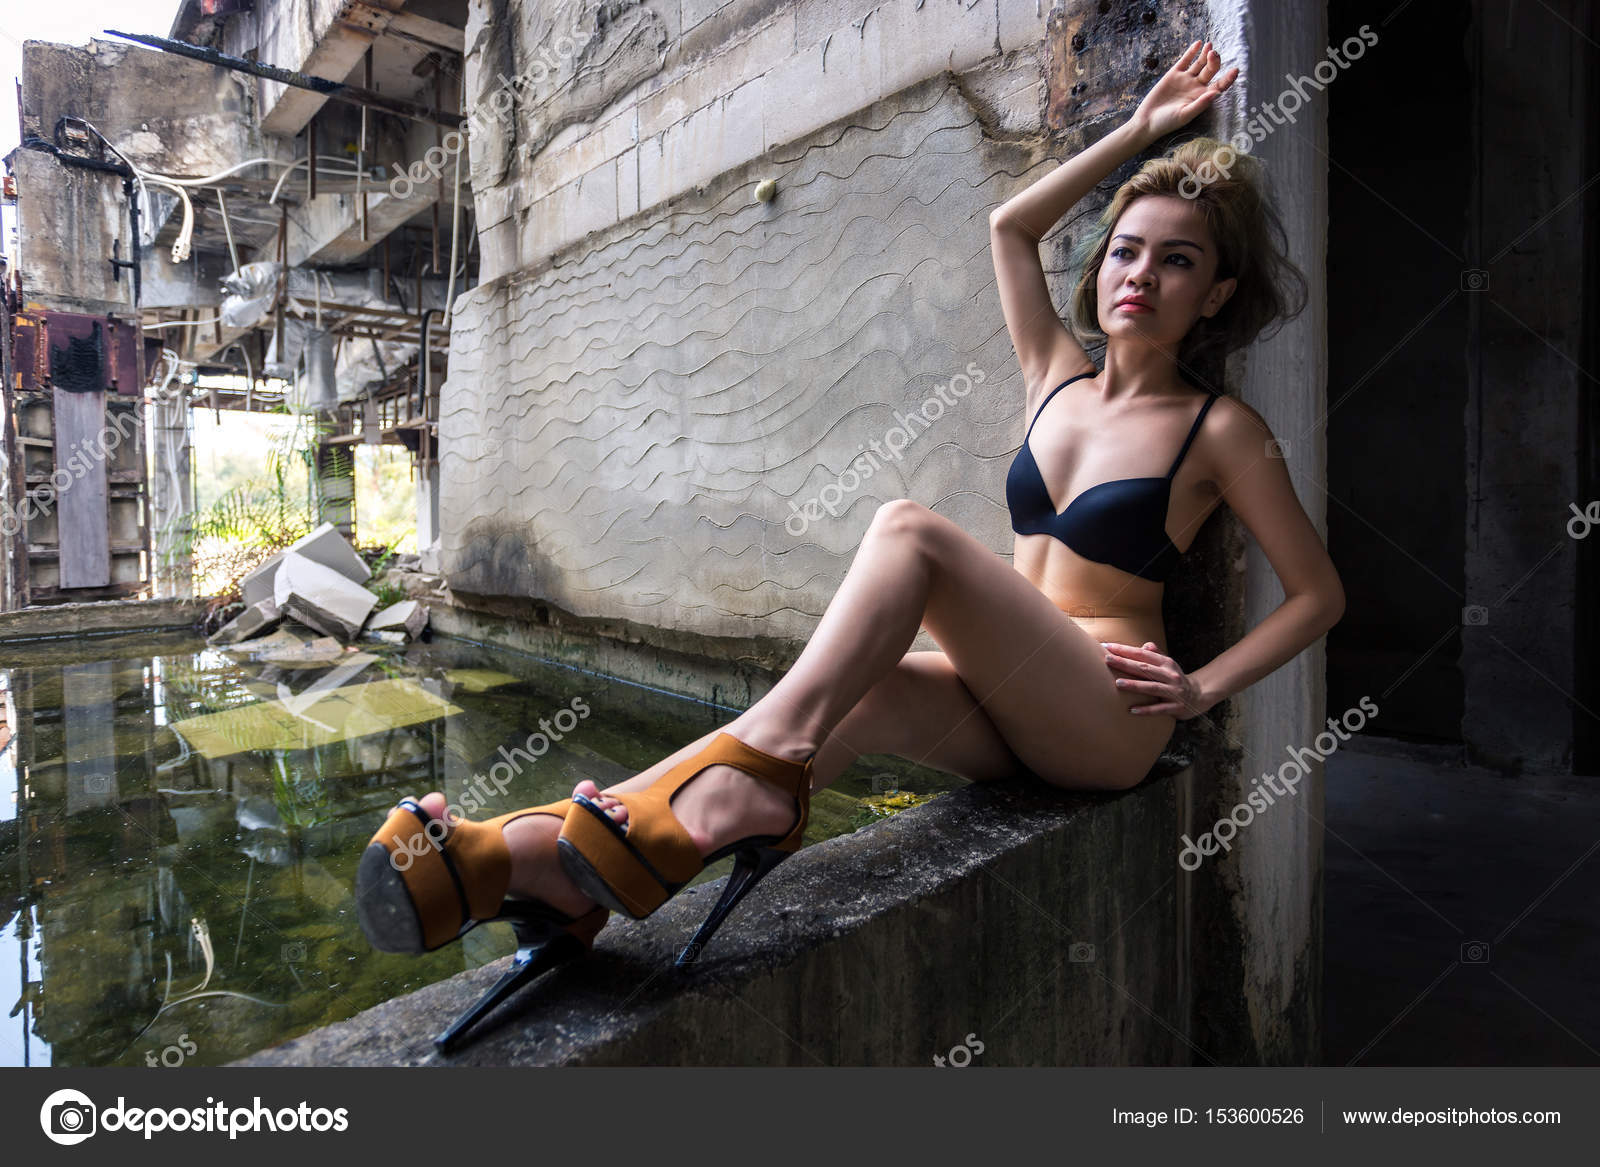 Model Posing In Abandoned Building Stock Photo C Dima266f 153600526